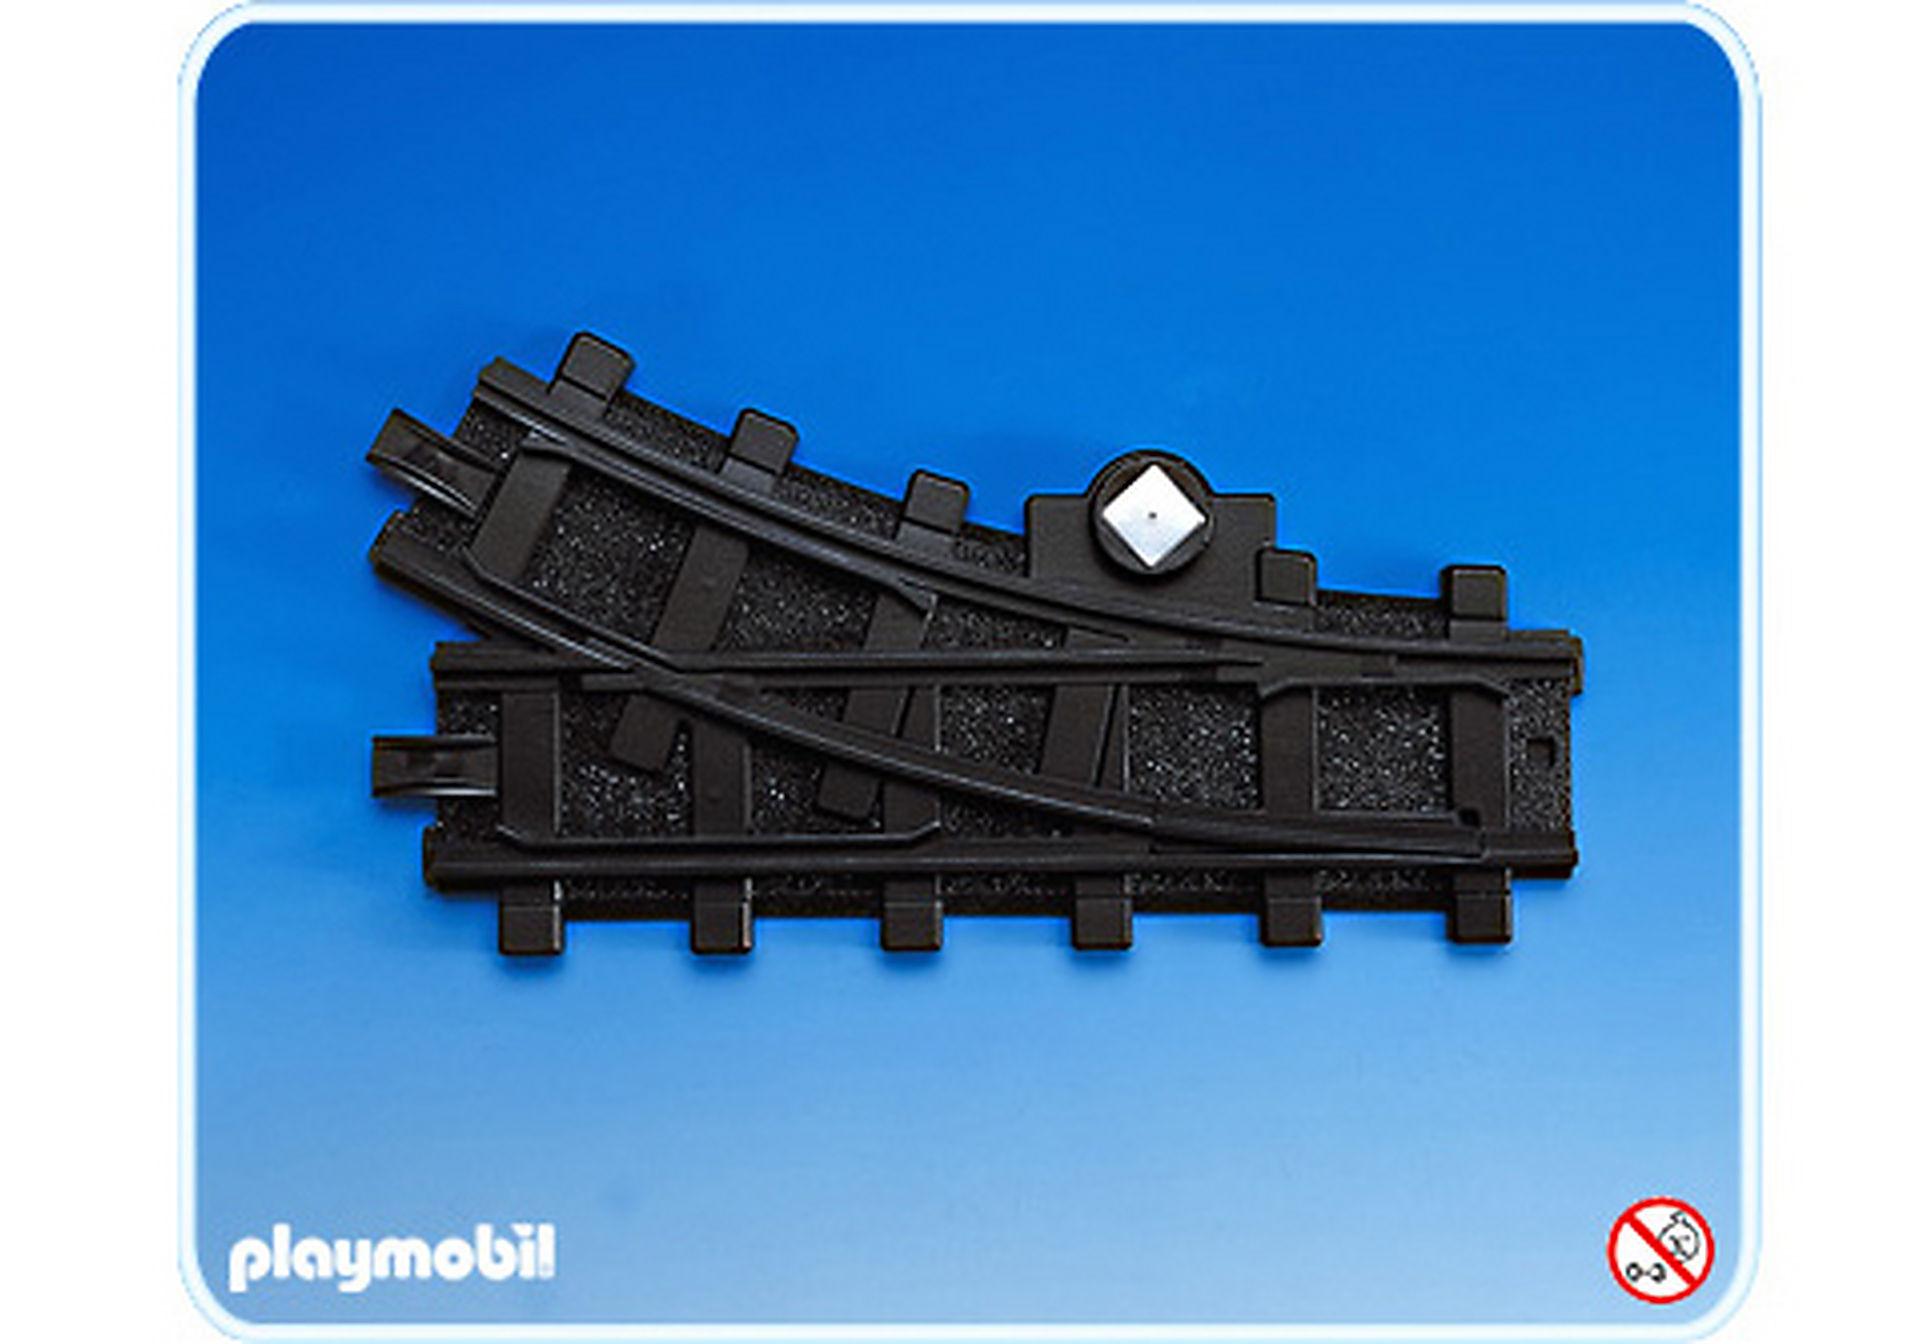 http://media.playmobil.com/i/playmobil/4389-A_product_detail/Embranchement droit